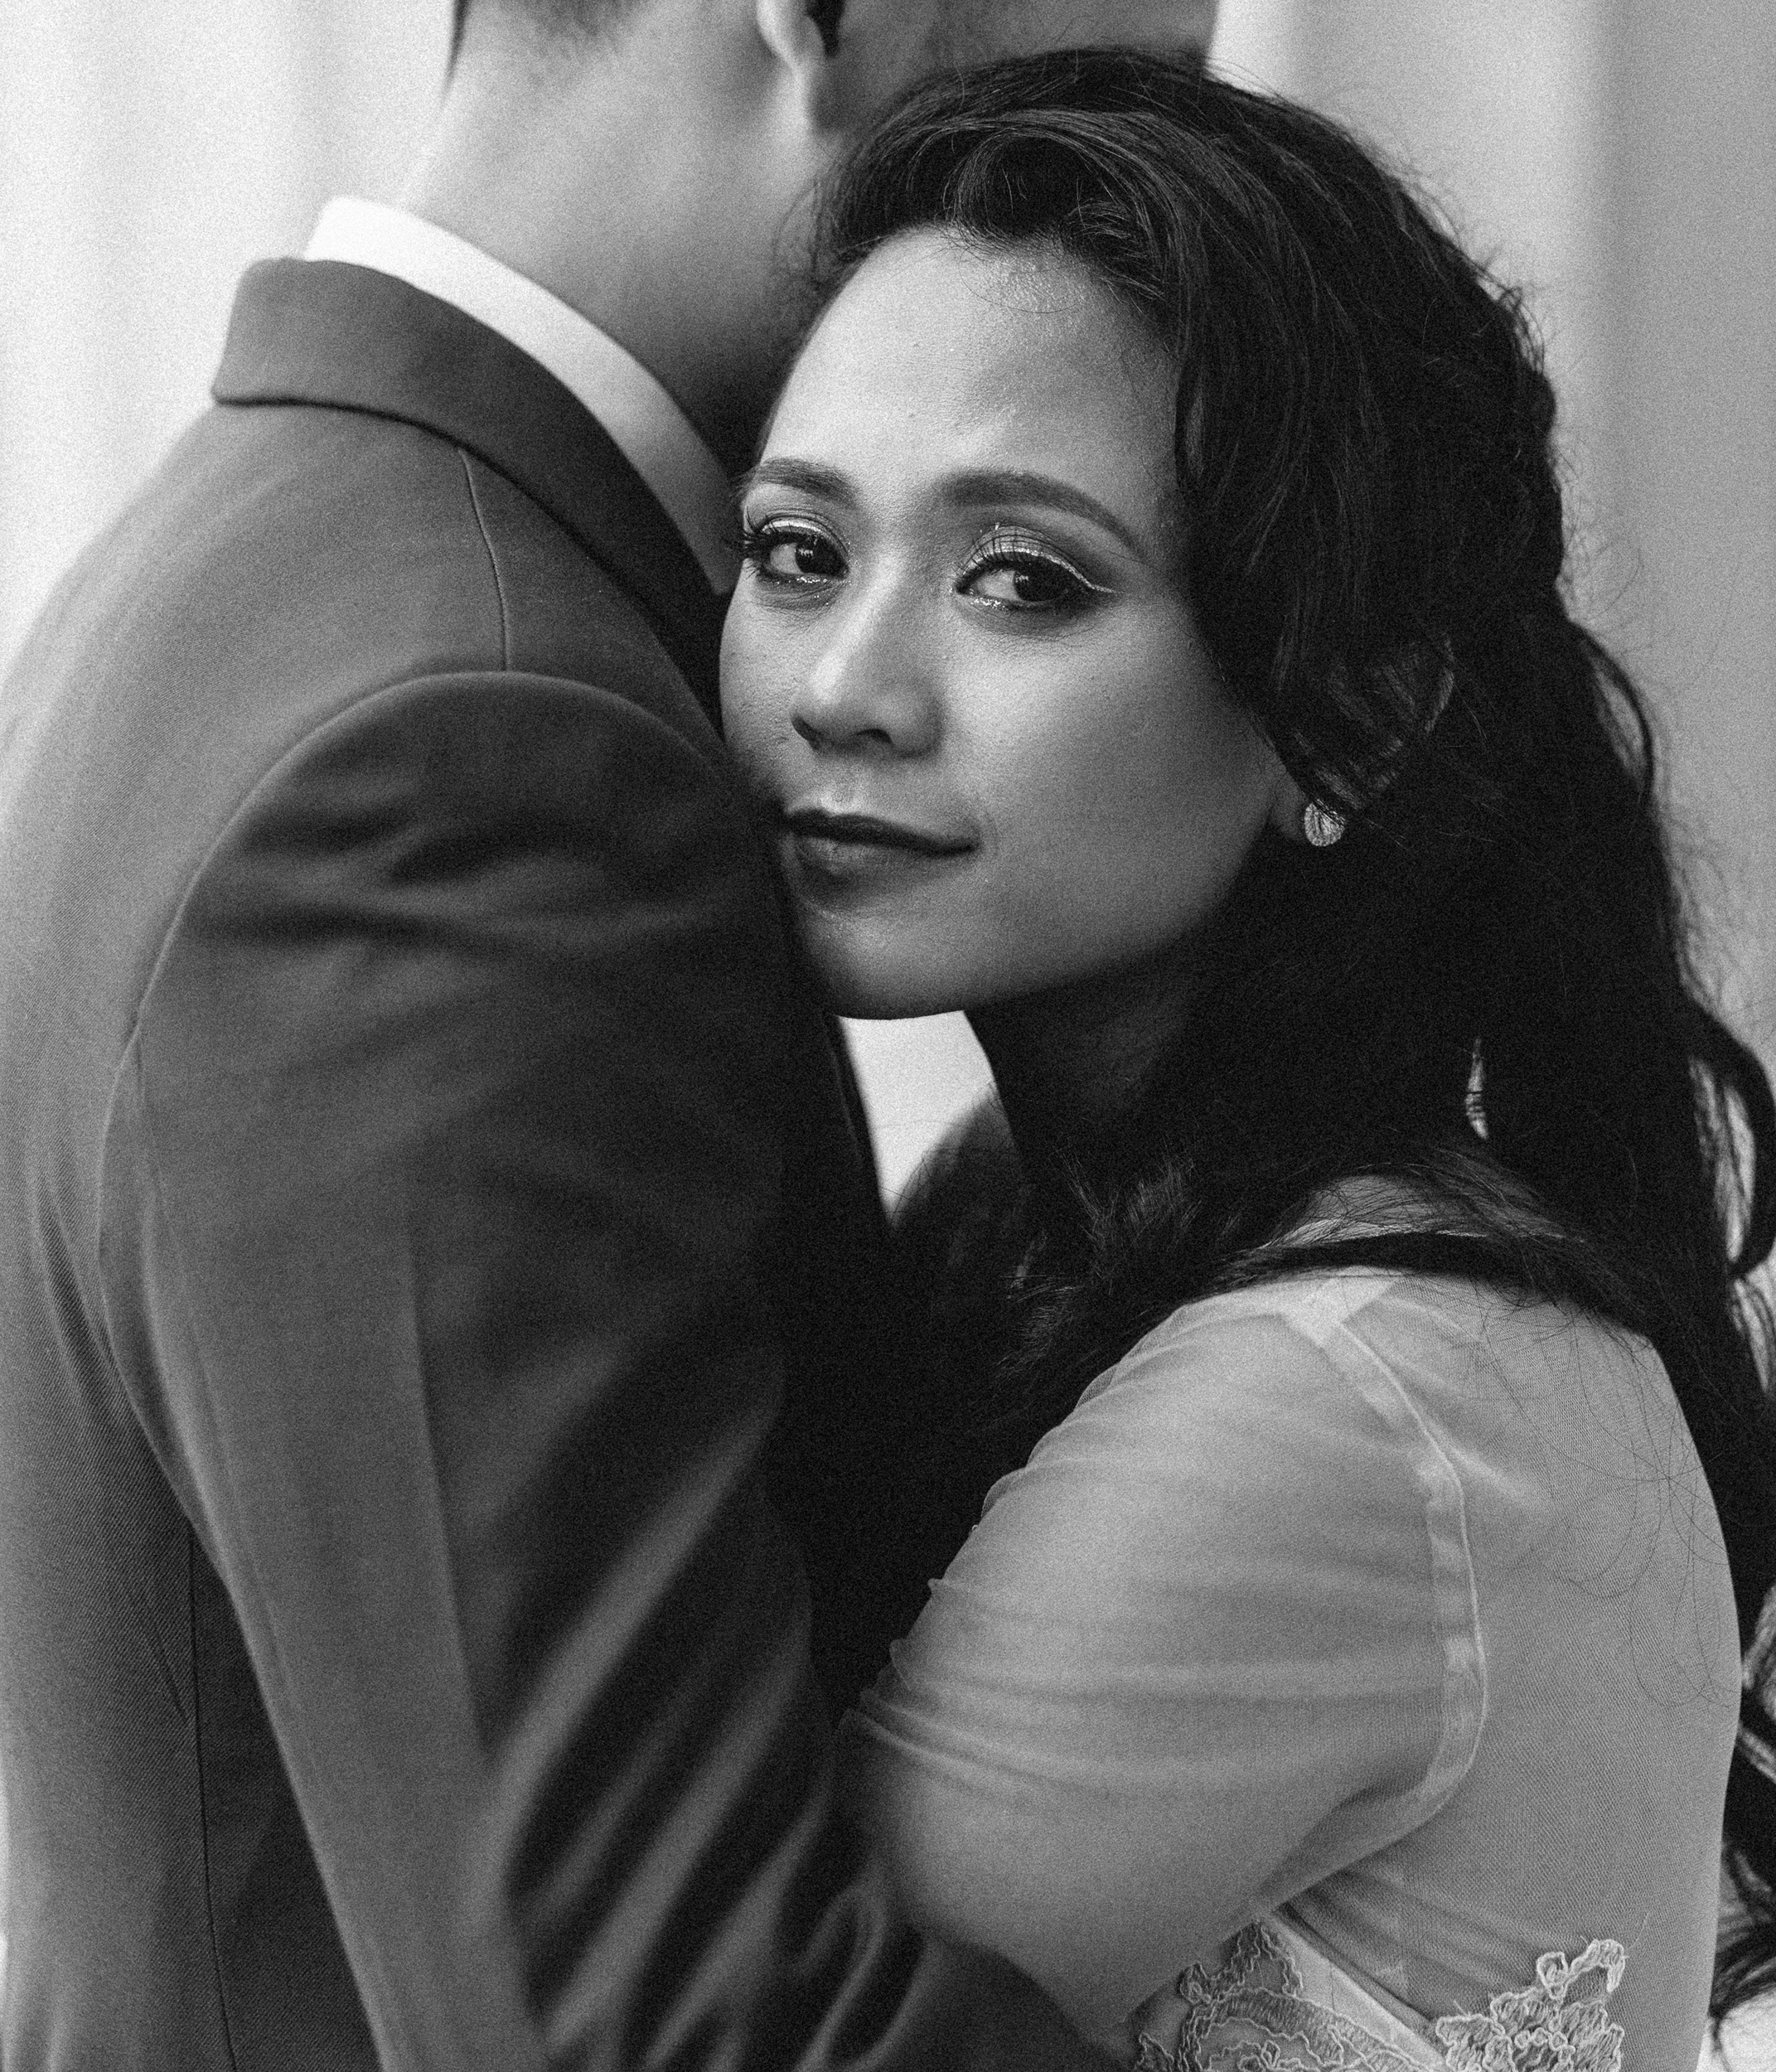 singapore-wedding-photographer-photography-wmt2017-047.jpg